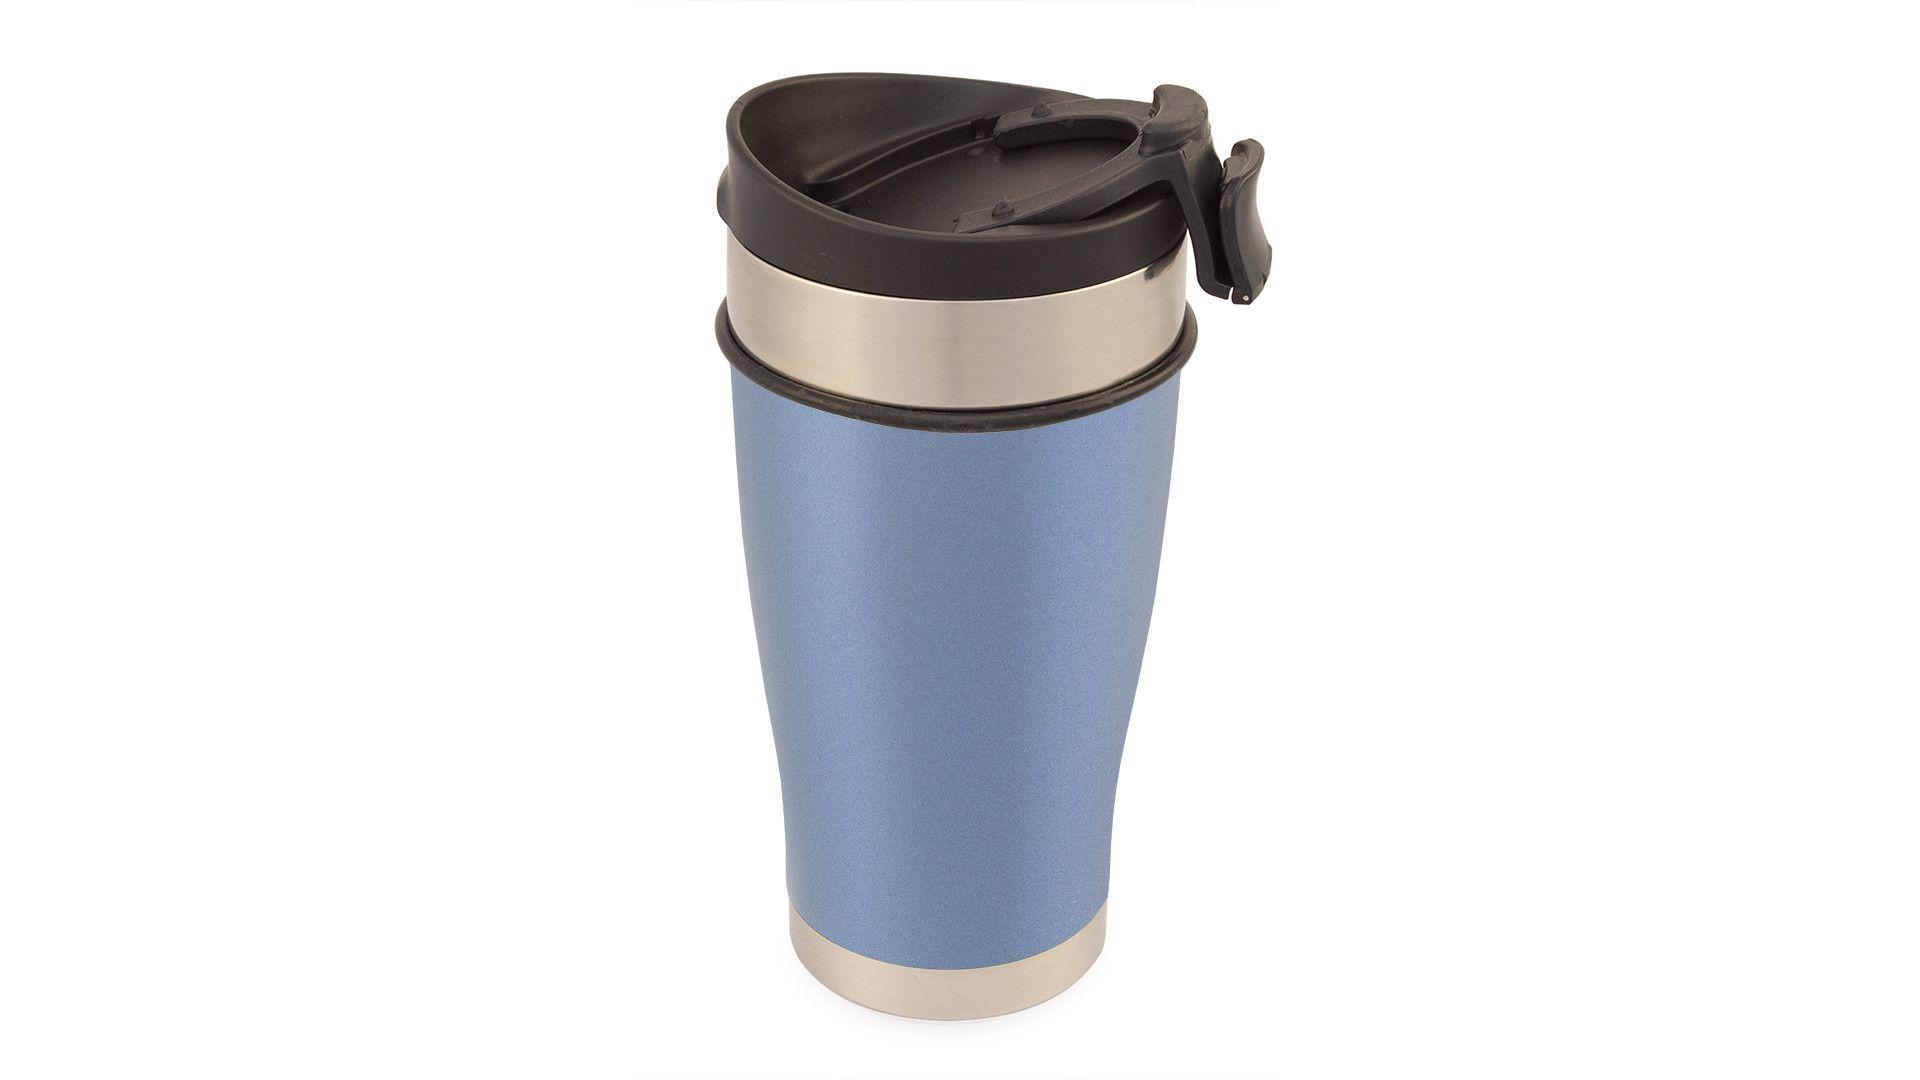 Coffee Tumbler 12 oz Insulated Travel Mug by Planetary Design